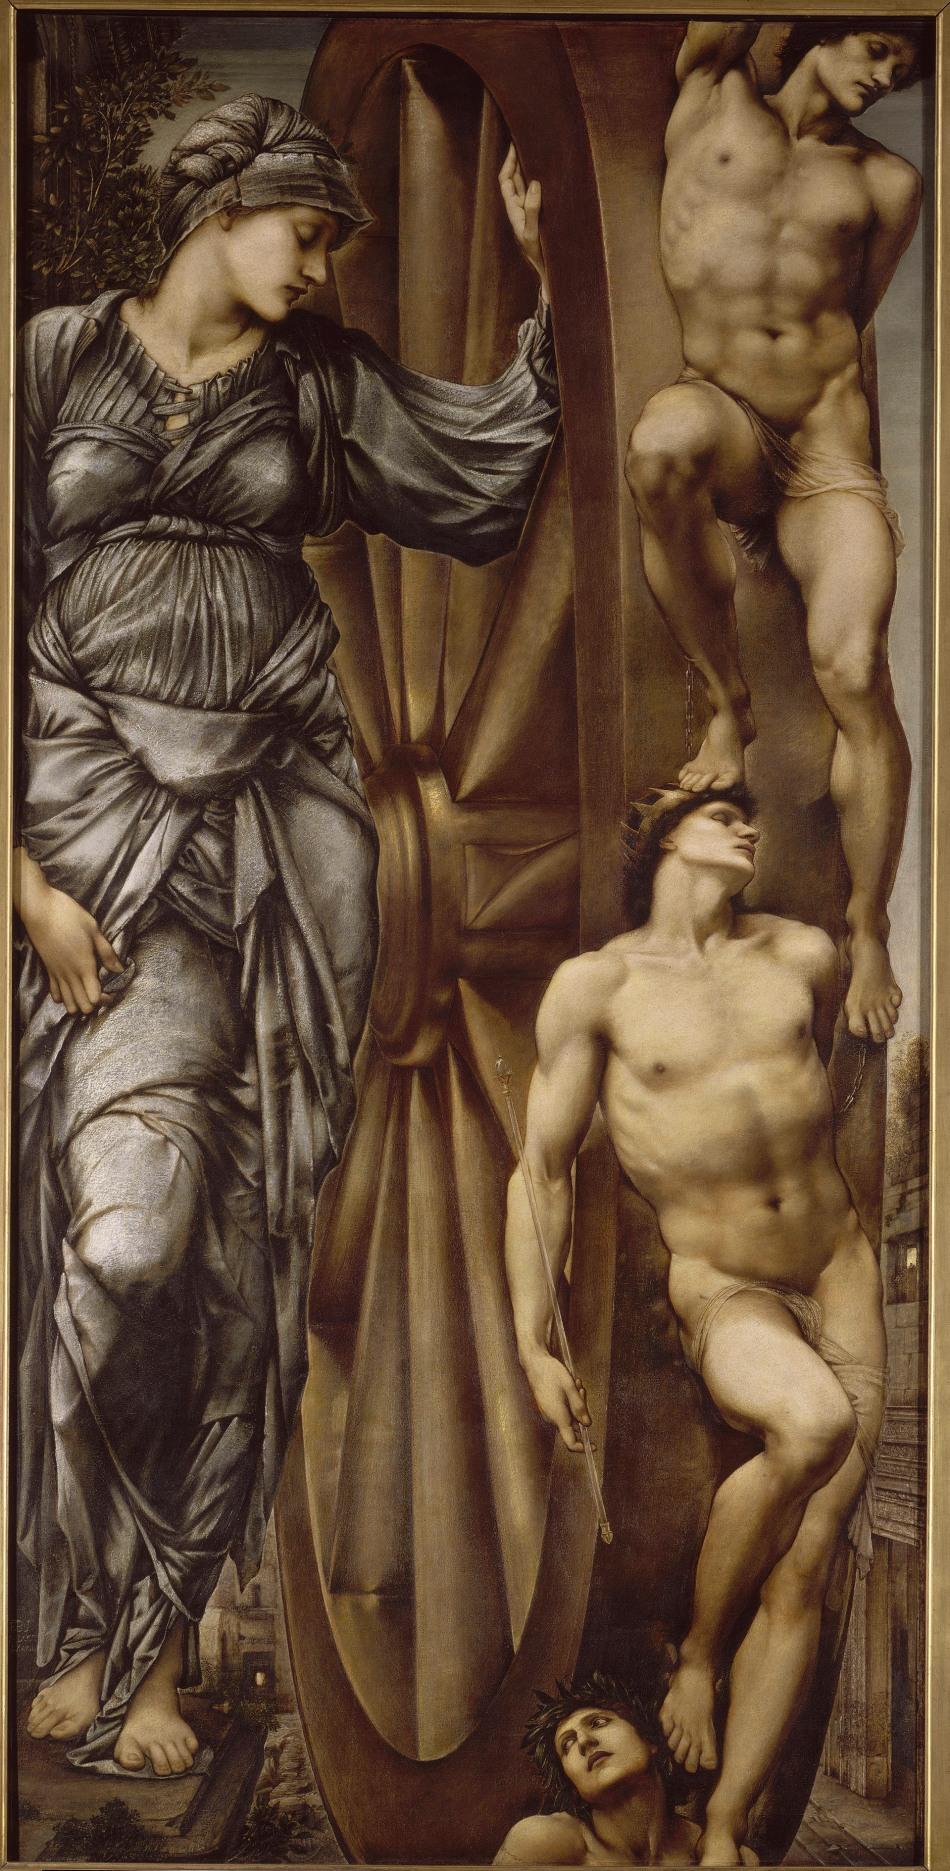 Edward Burne-Jones: The Wheel of Fortune.